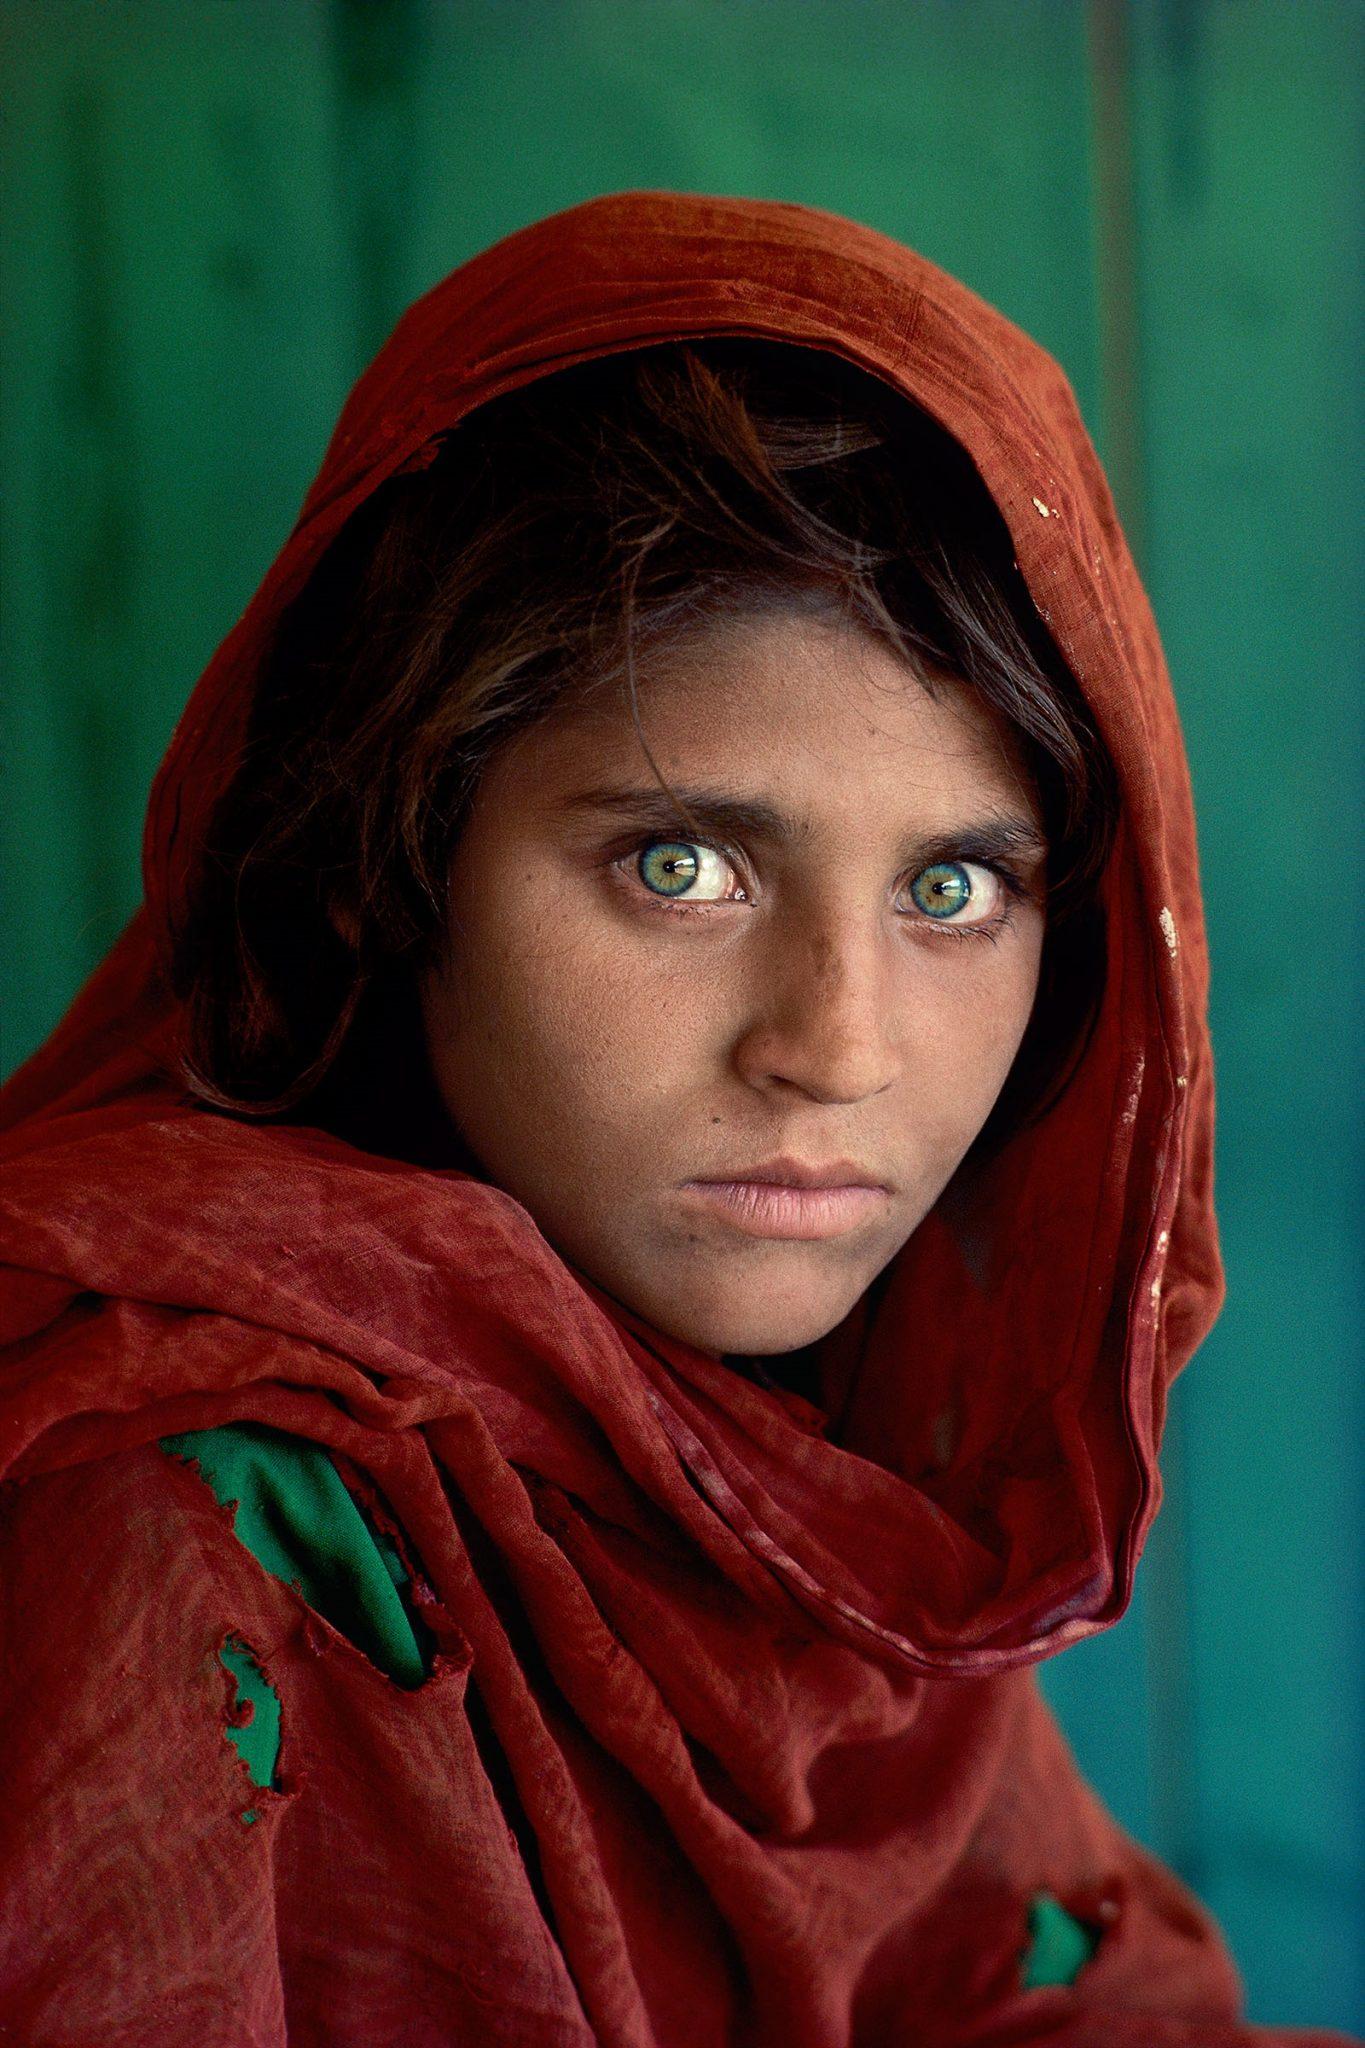 Peshar ragazza pakistana dagli occhi verdi di Steve McCurry